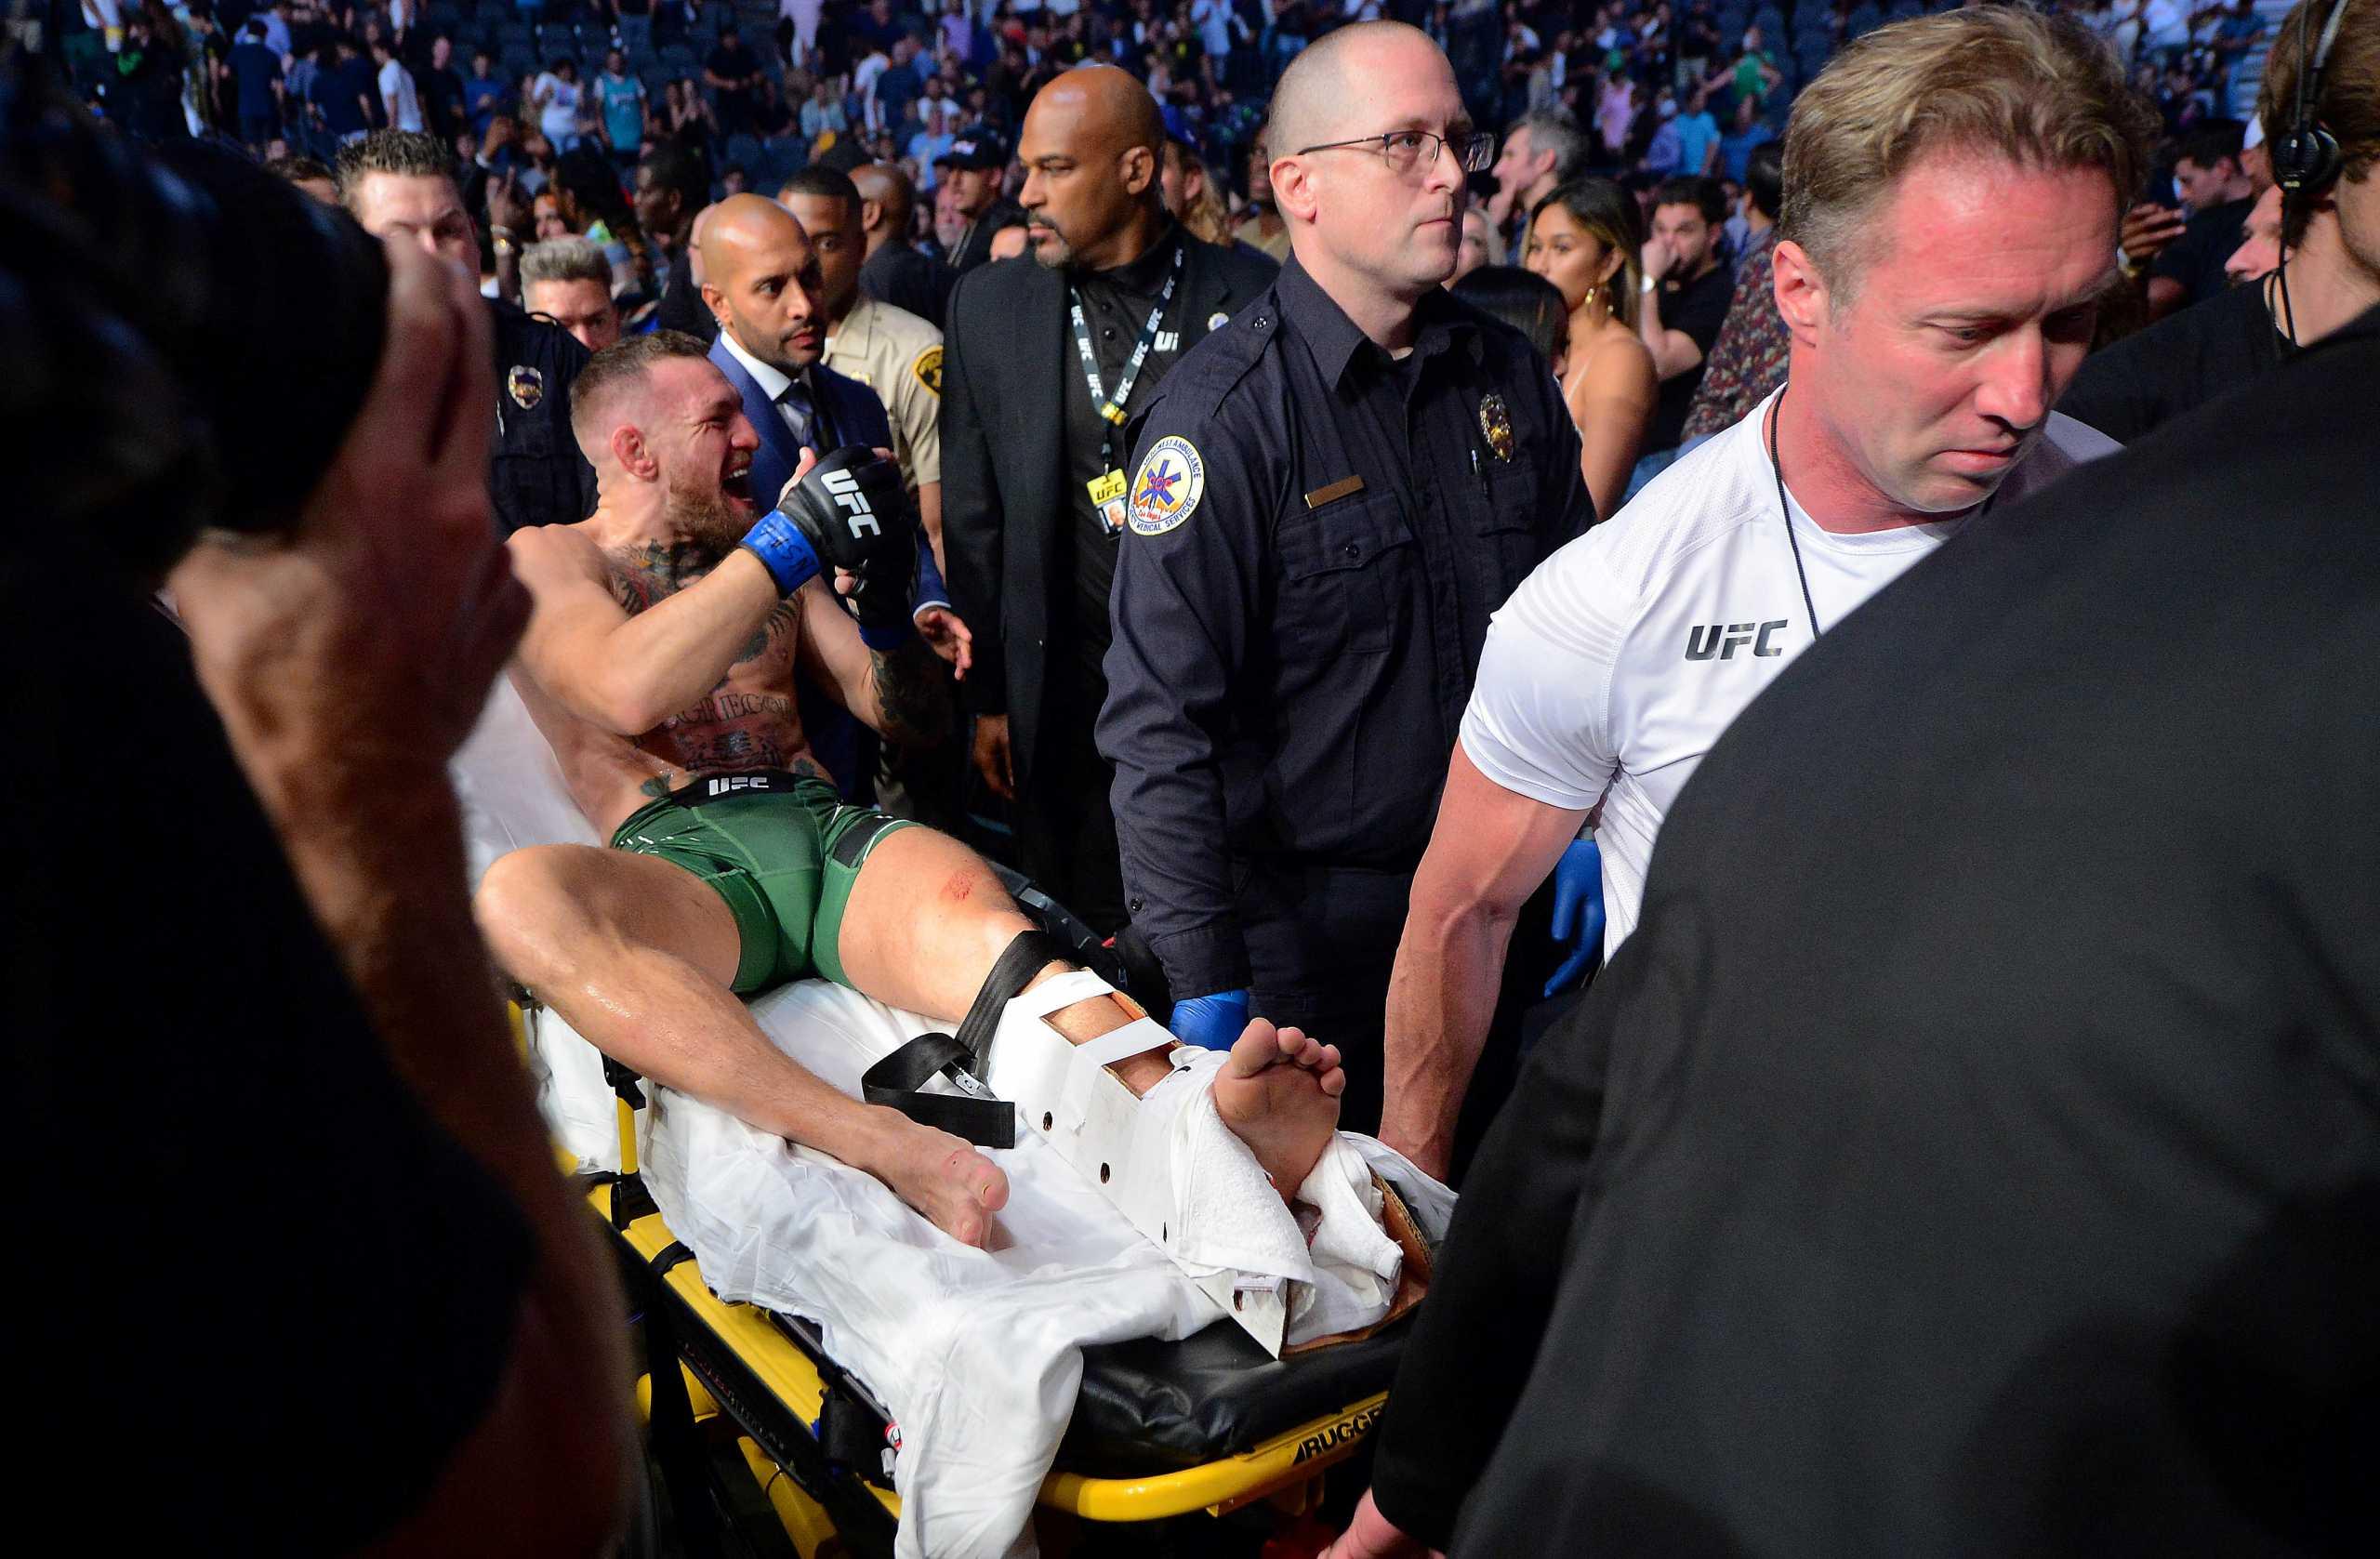 Conor McGregor – Dustin Poirier: Ήττα για τον Ιρλανδό, που «διέλυσε» το πόδι του